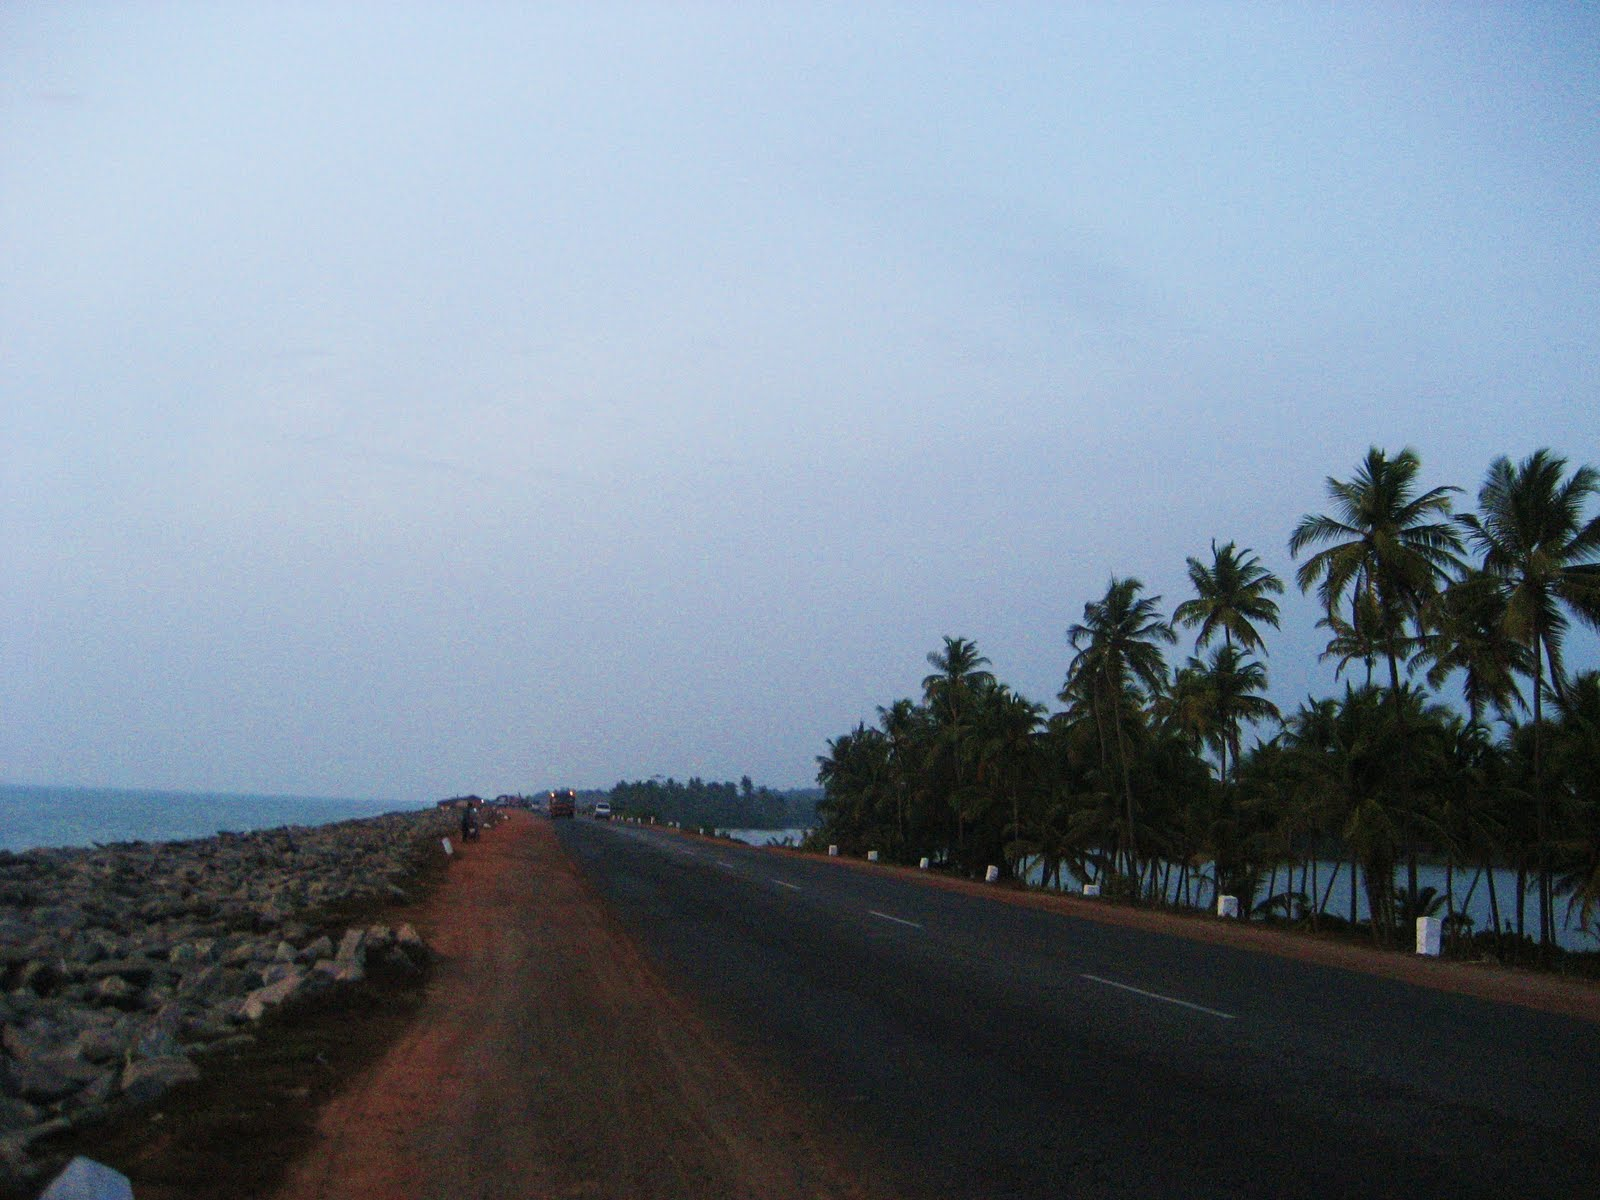 Highway along Maravanthe